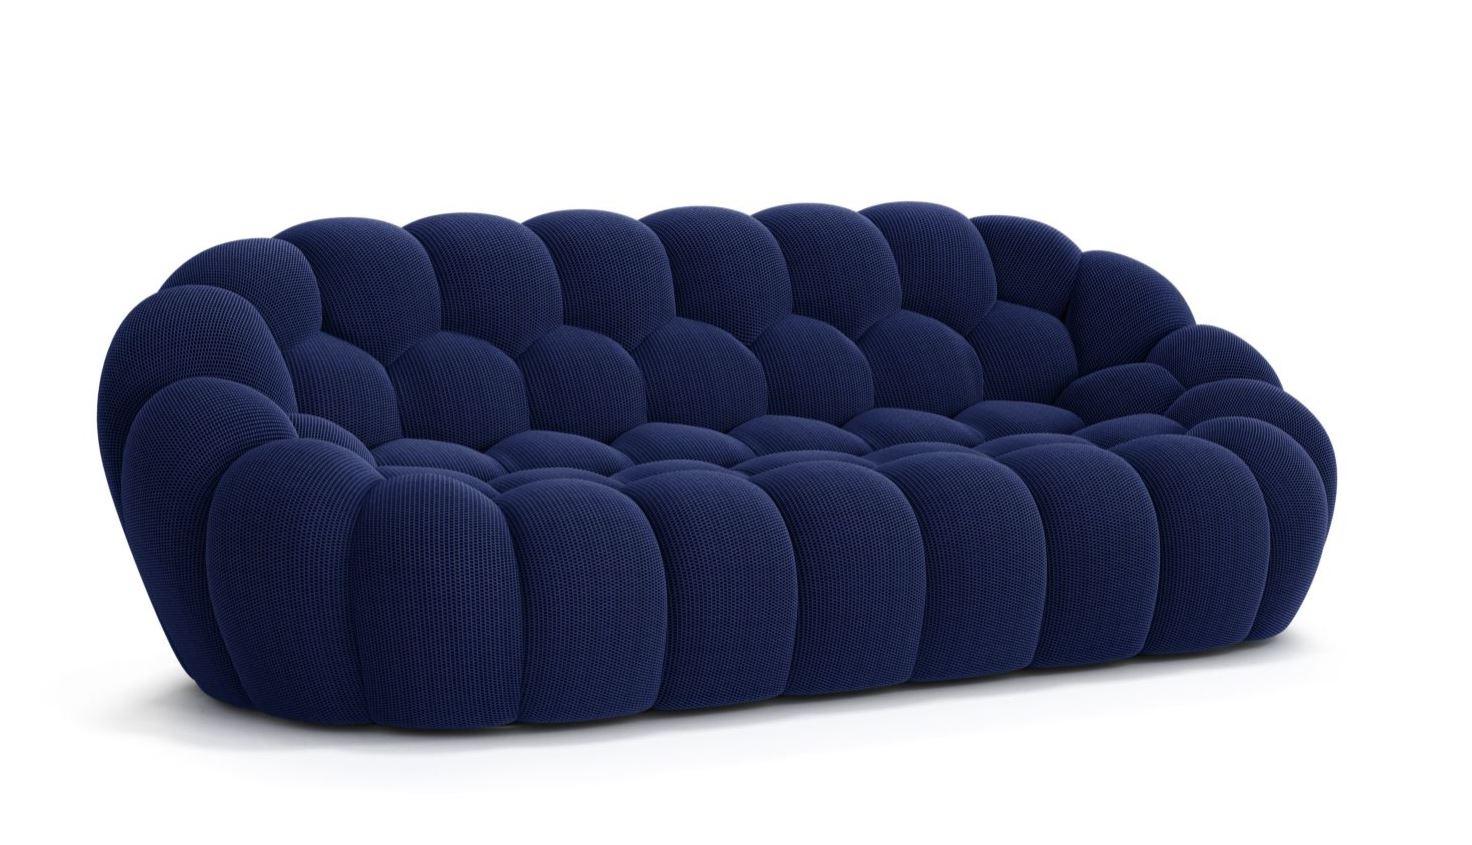 Bubble Sofa Roche Bobois details about roche bobois bubble large 3 seat sofa zeffiro new in stock usa